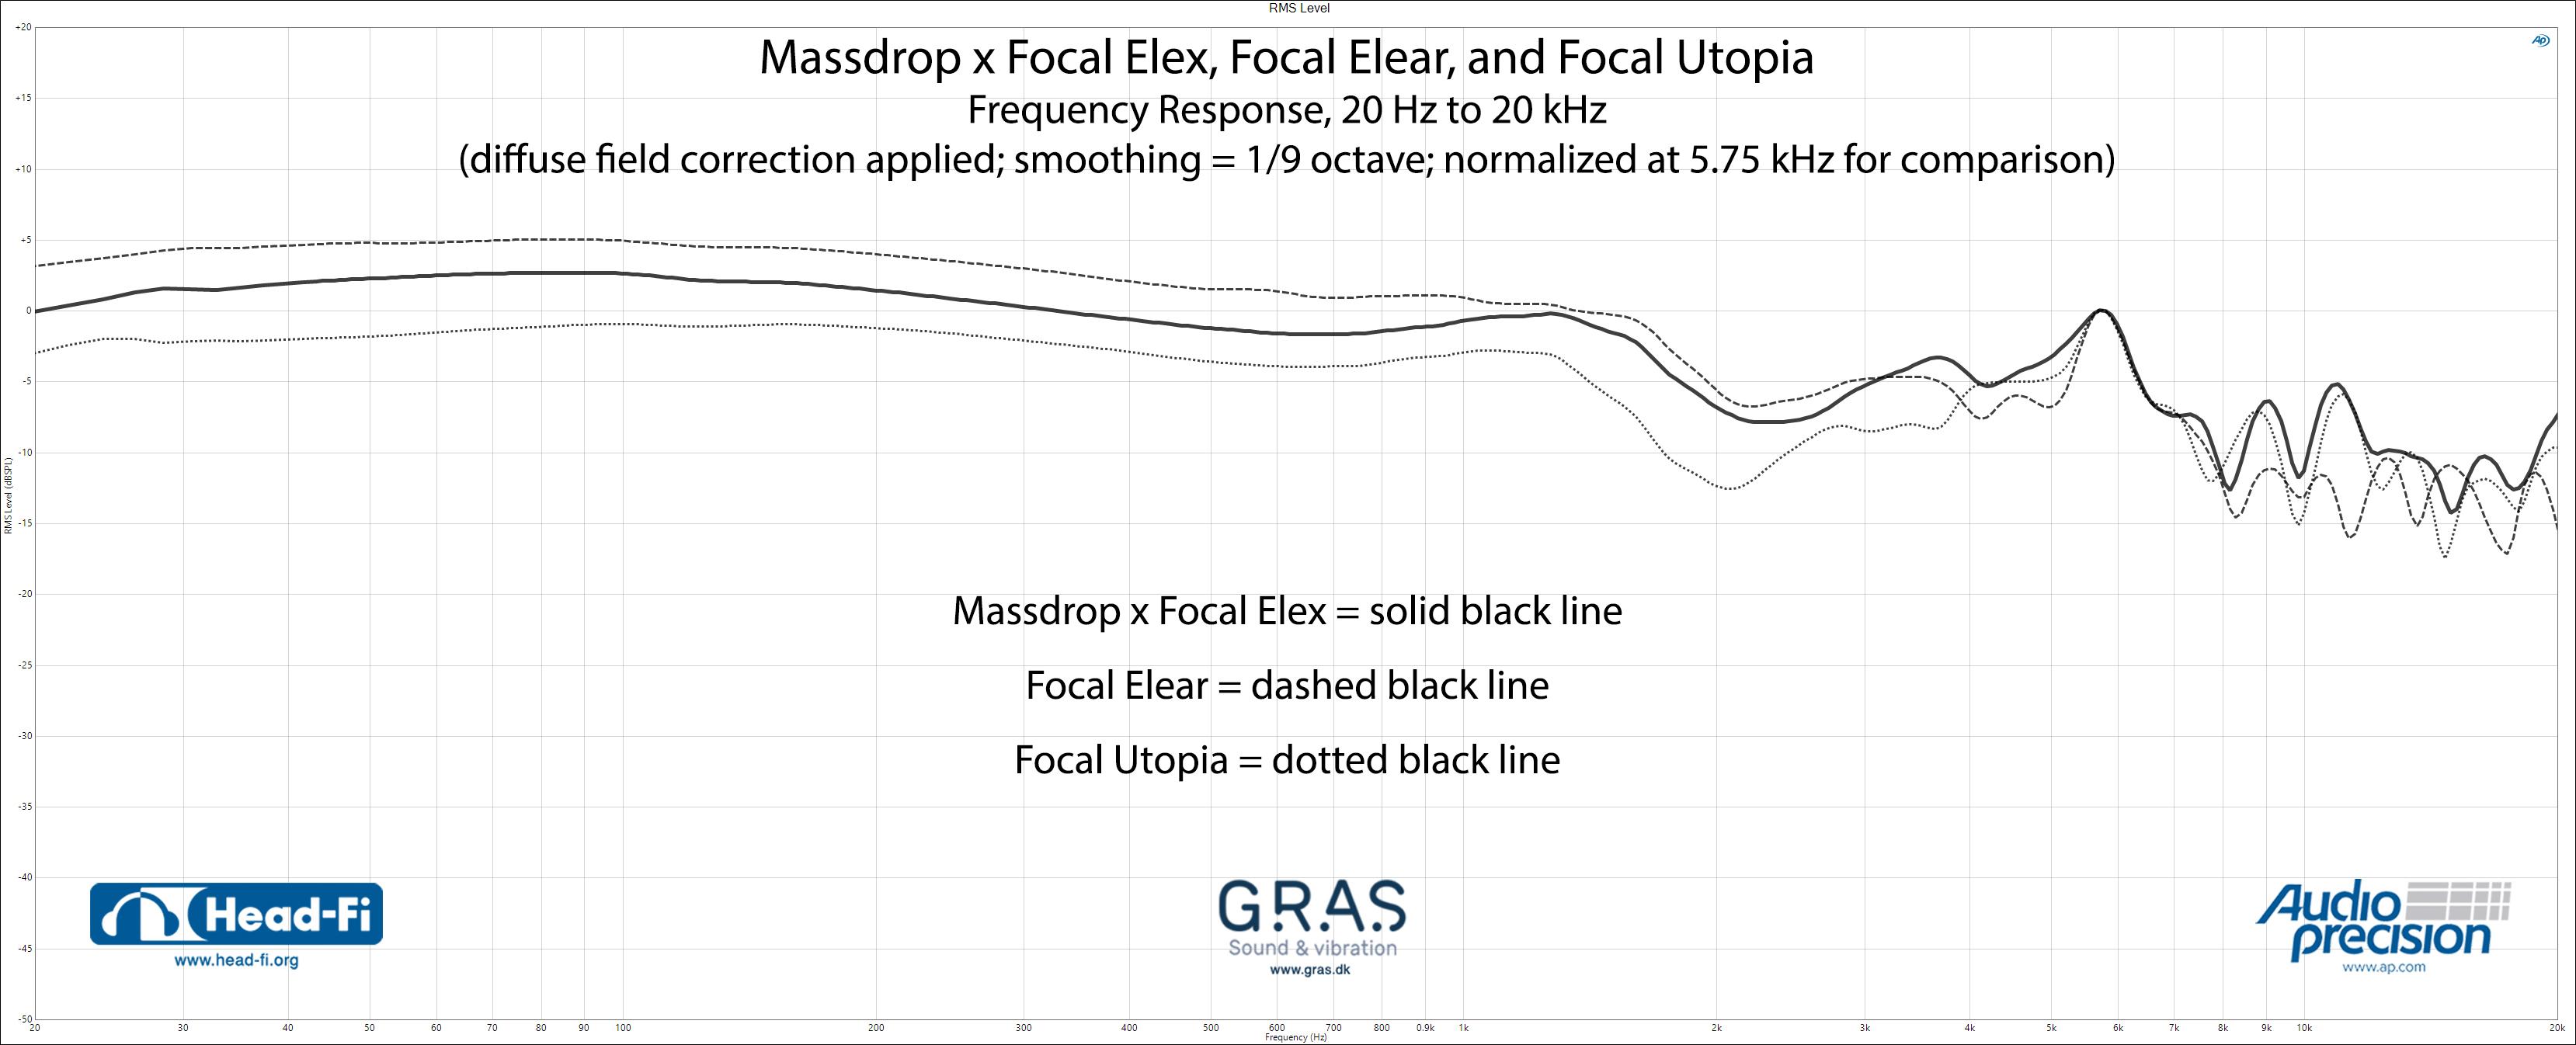 RMS-Level_1-9_DF_Normalize-5.75-kHz_Massdrop-x-Focal-Elex_Focal-Elear_Focal-Utopia.jpg